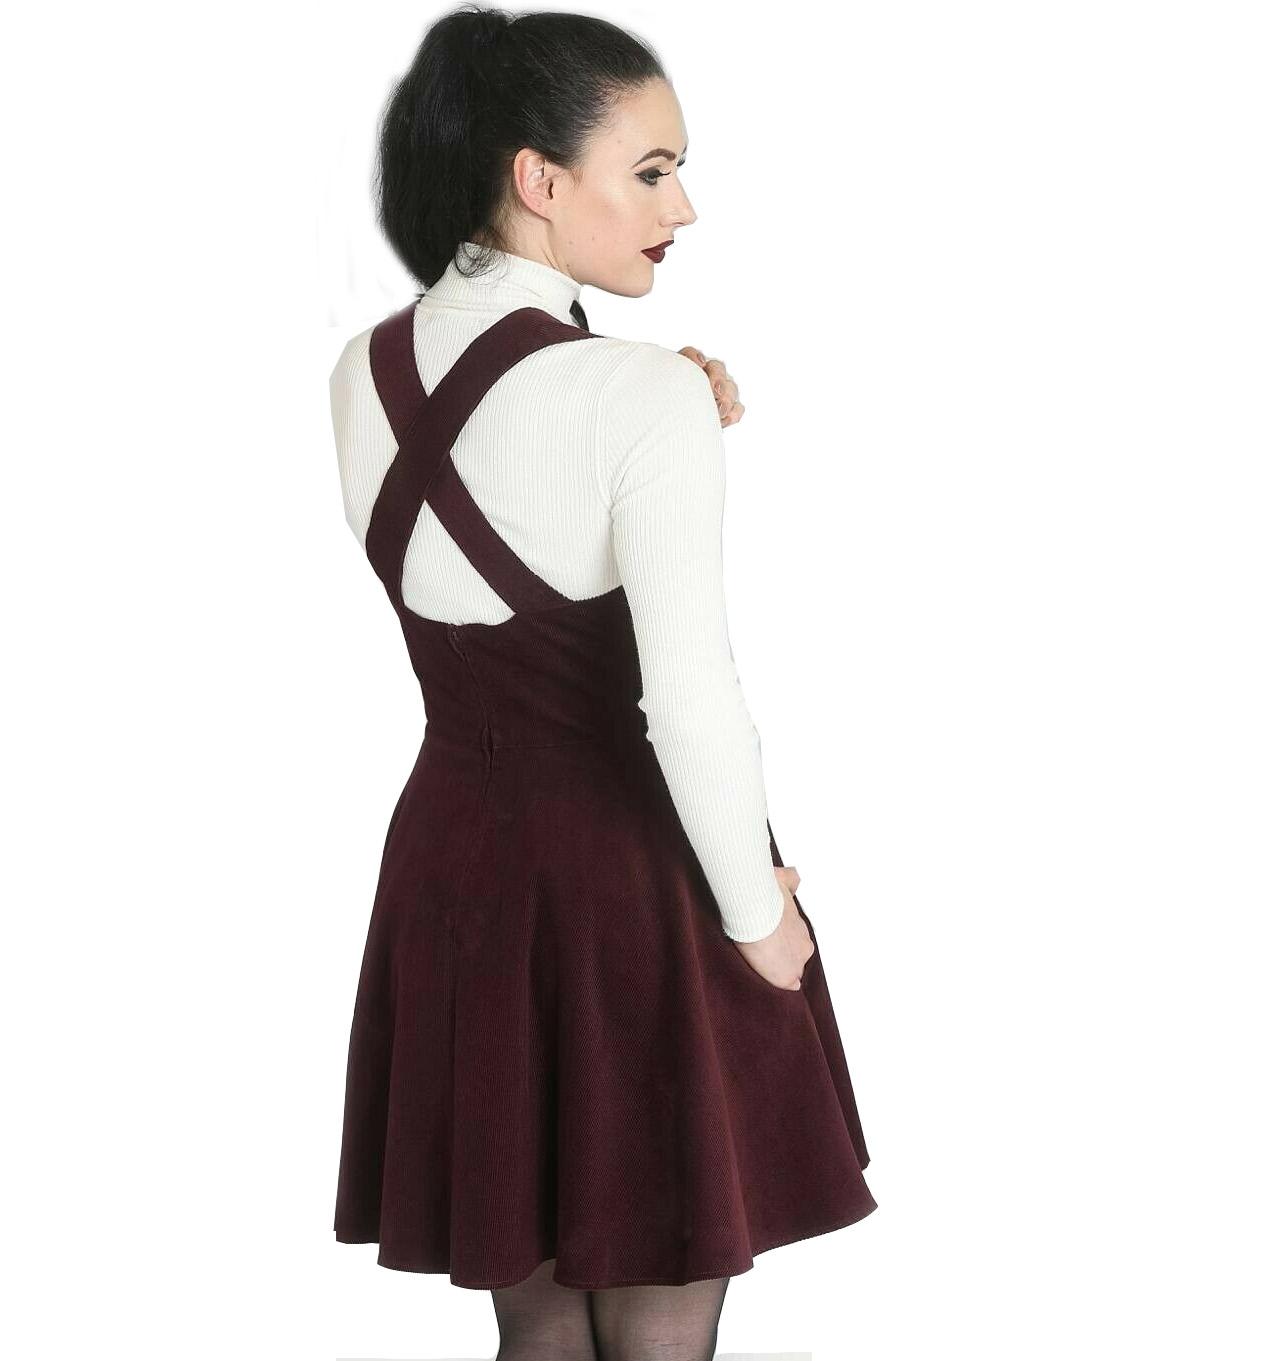 Hell-Bunny-Rockabilly-Corduroy-Mini-Dress-WONDER-YEARS-Pinafore-Wine-All-Sizes thumbnail 33